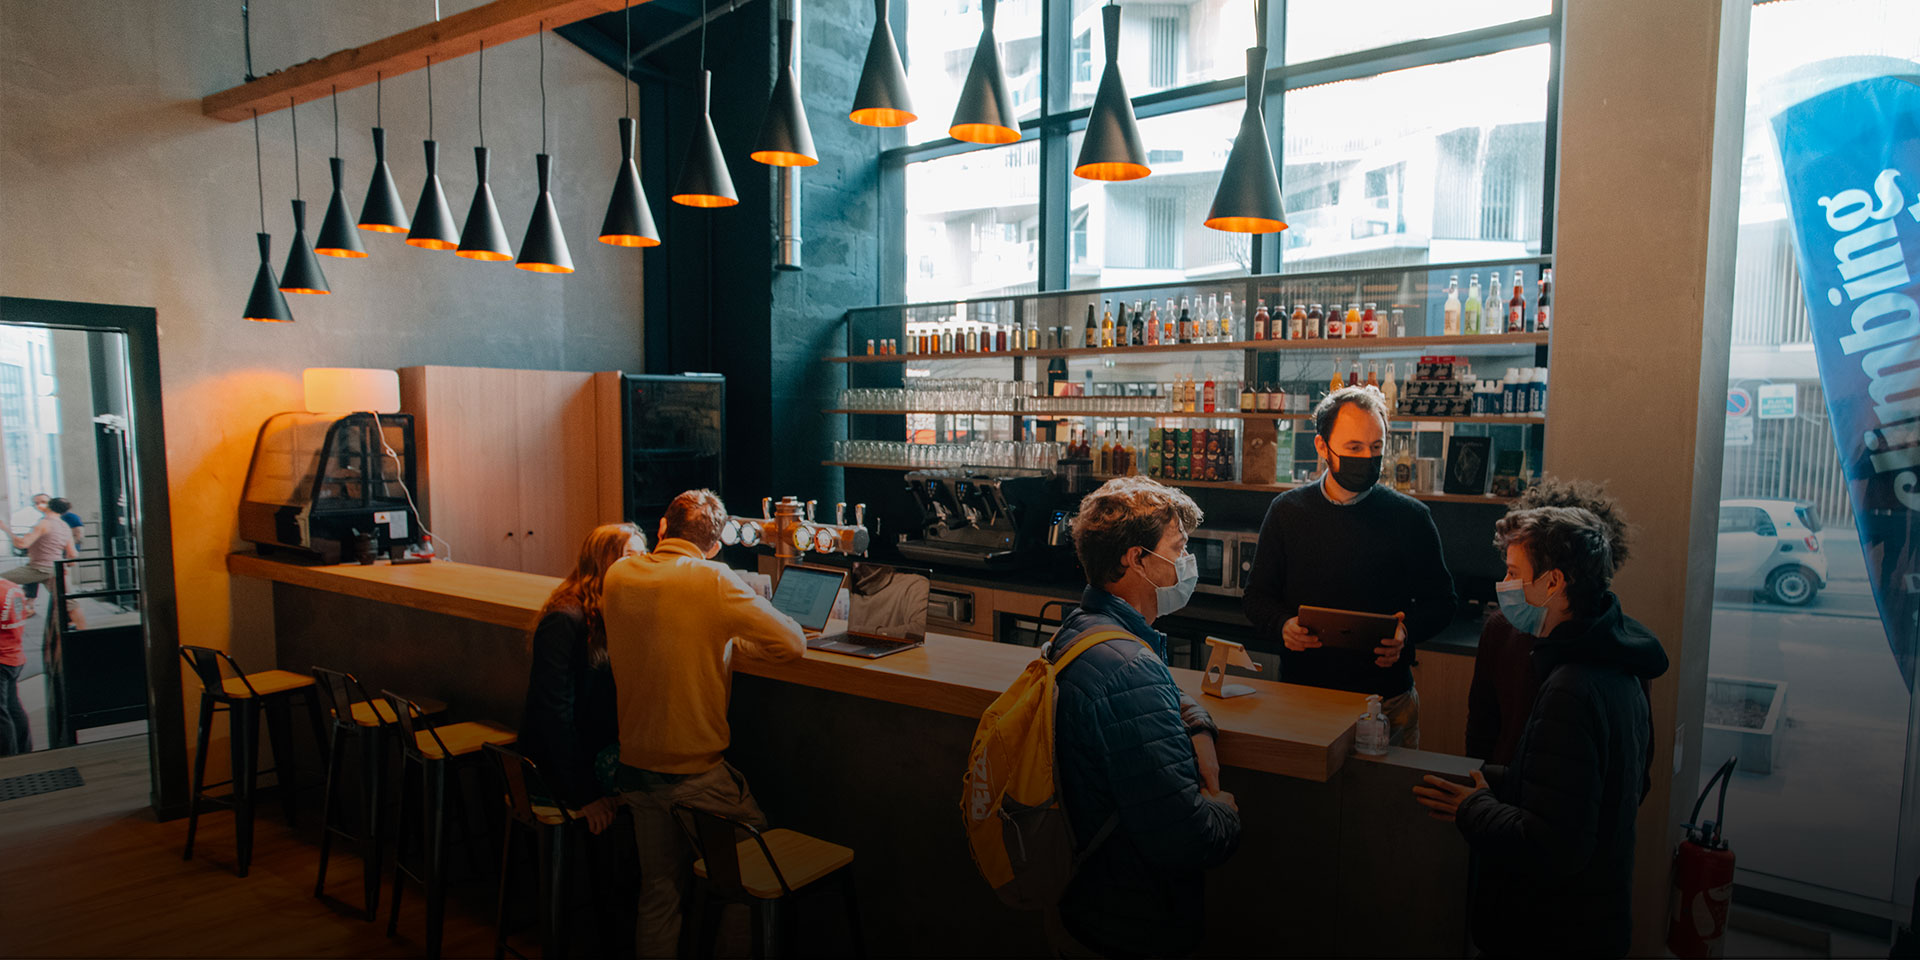 Bar dans quartier des Batignolles - Lieu fun à Paris 17